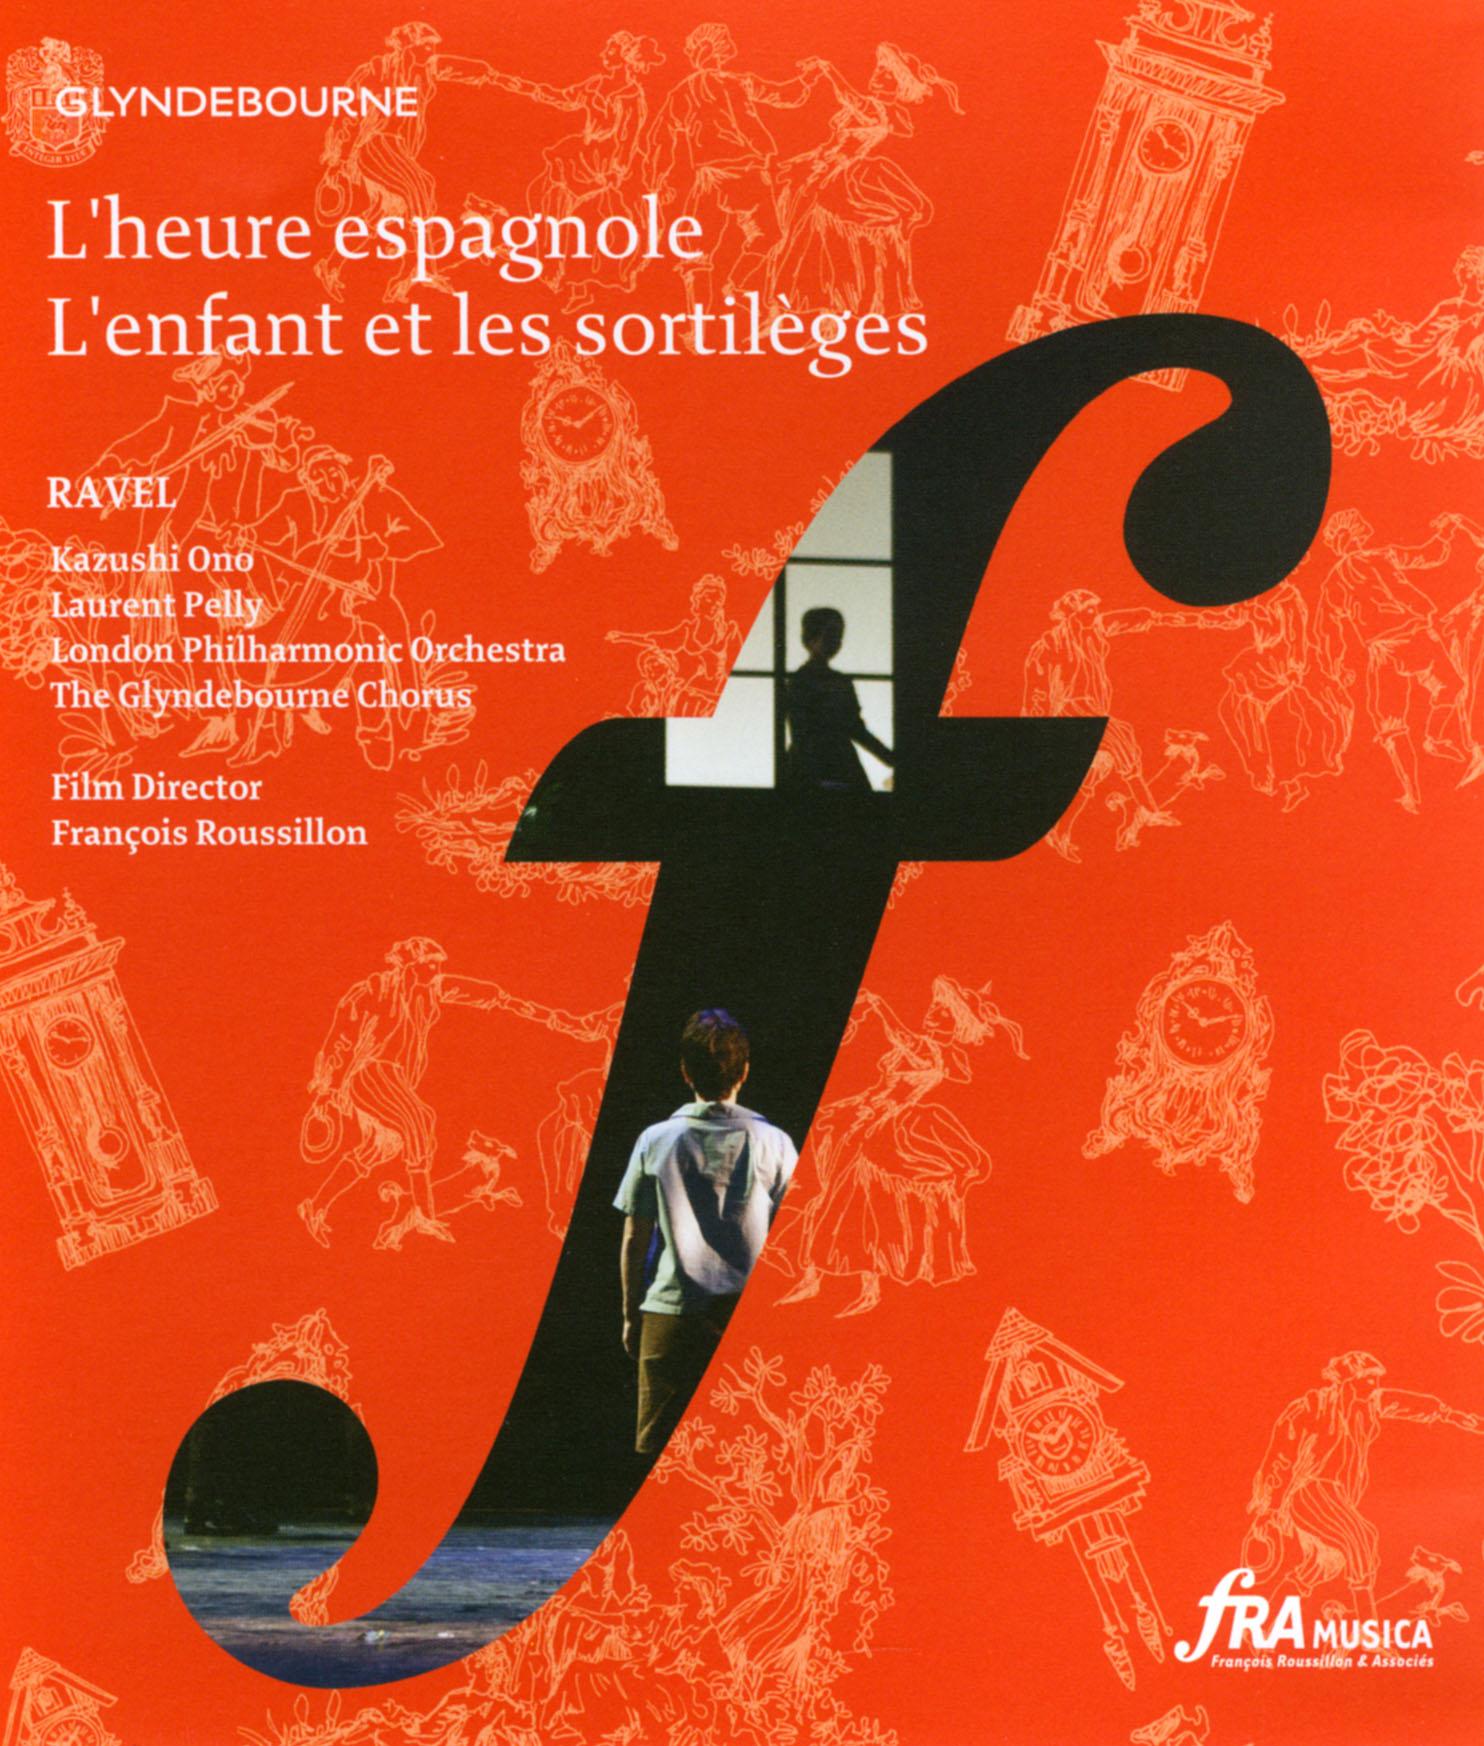 L'Heure Espagnole/L'Enfant et les Sortileges (Glyndebourne)